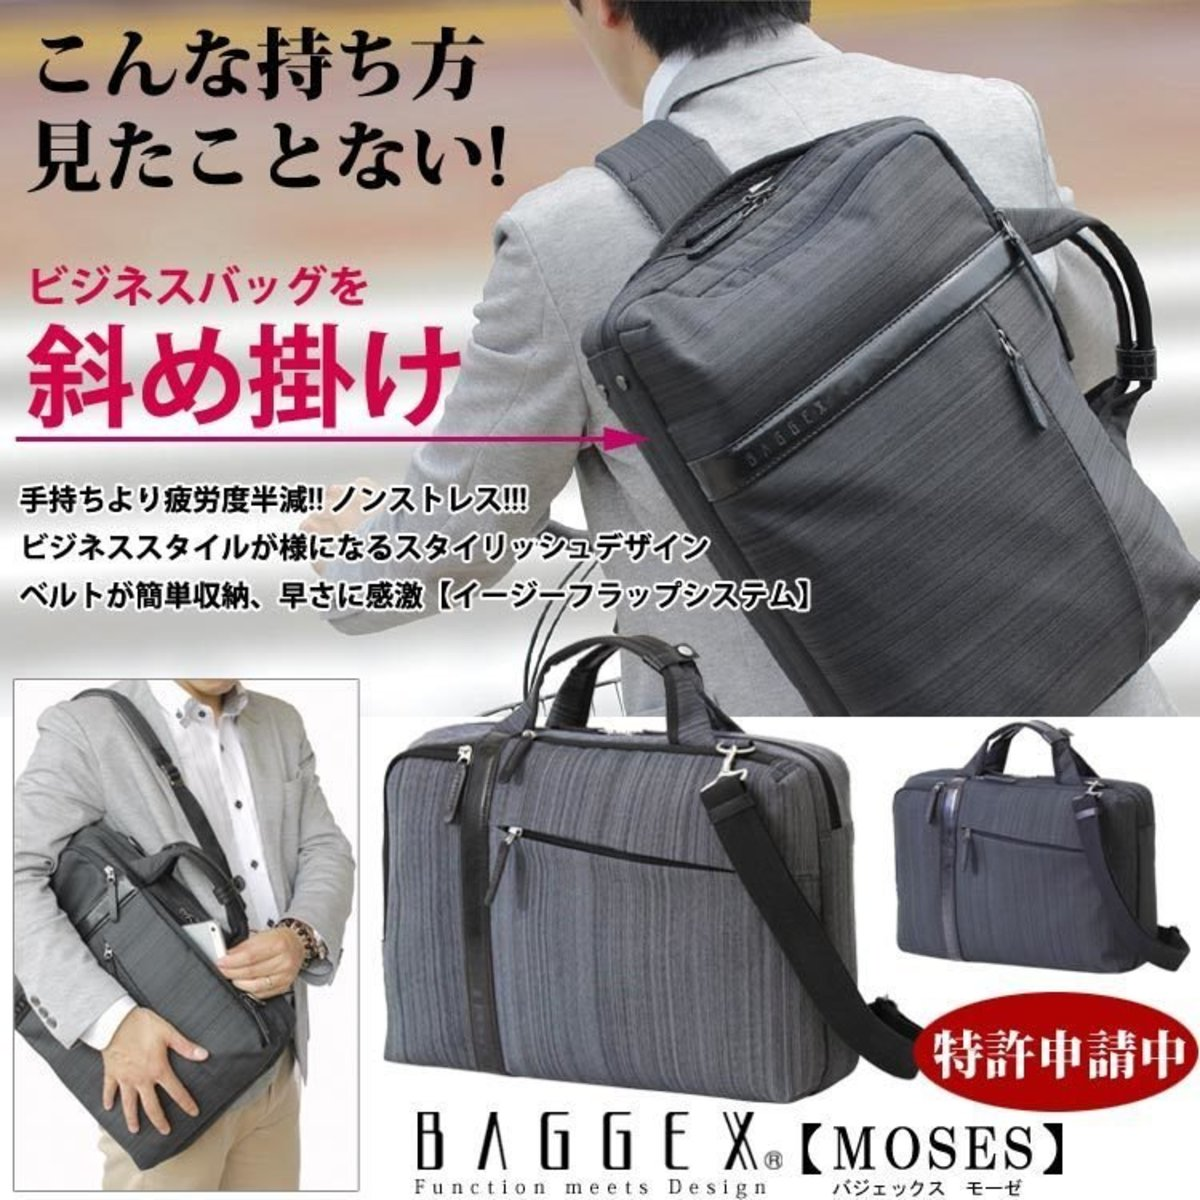 Japan Brand 3-Way Briefcase